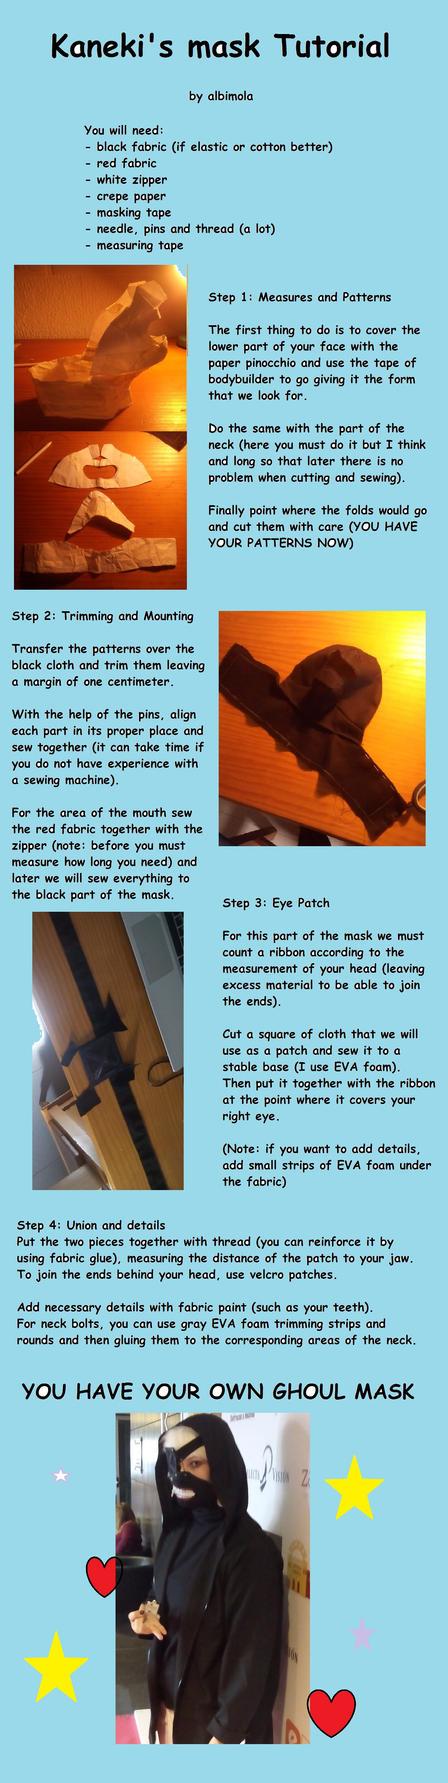 Kaneki's mask tutorial by albimola